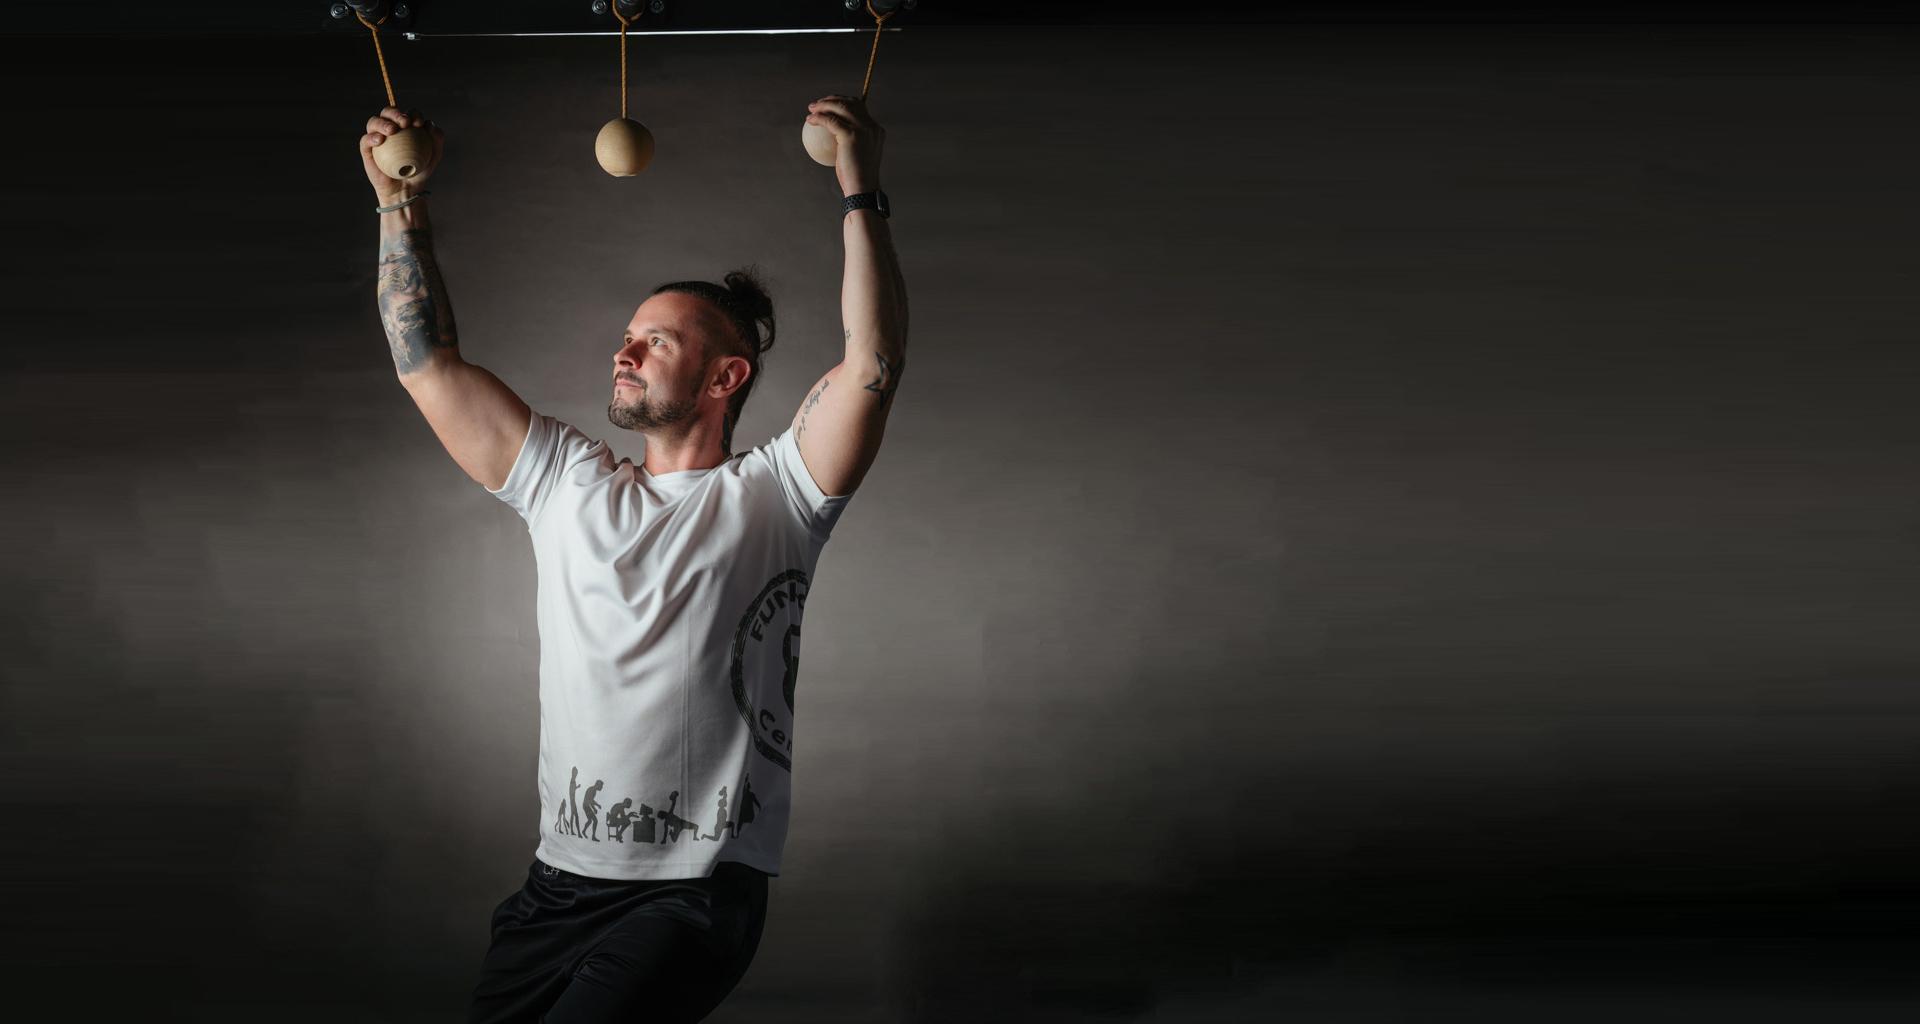 Martin Kralovansky funkcness centrum trener